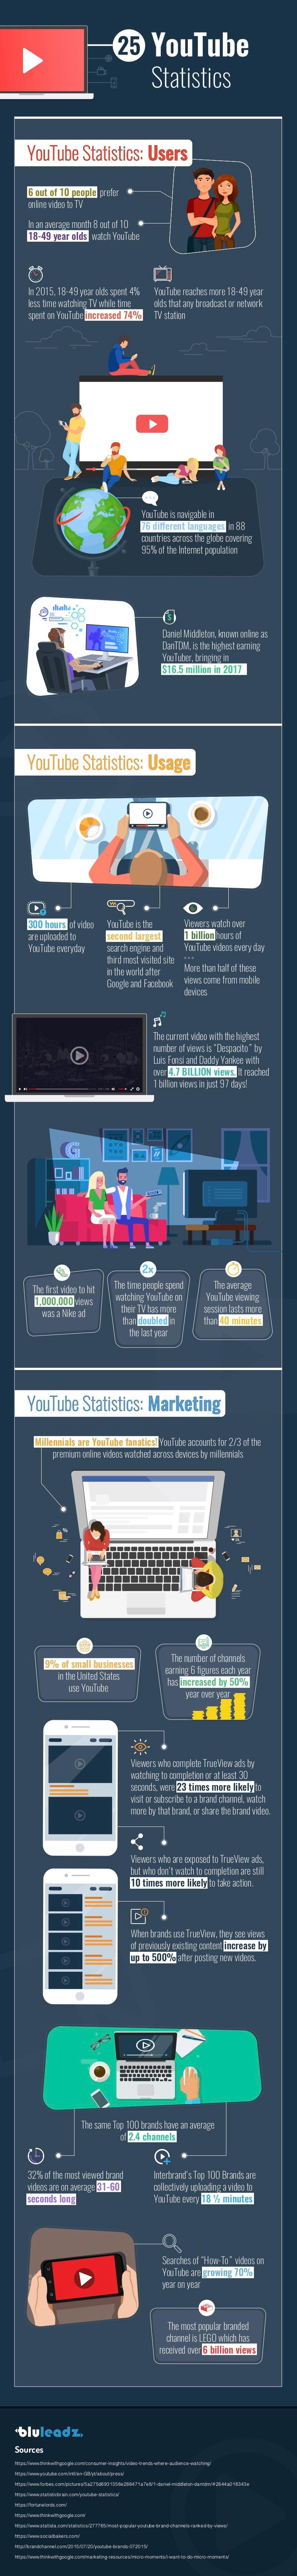 BLU_074_INF - 25 YouTube Statistics of 2017